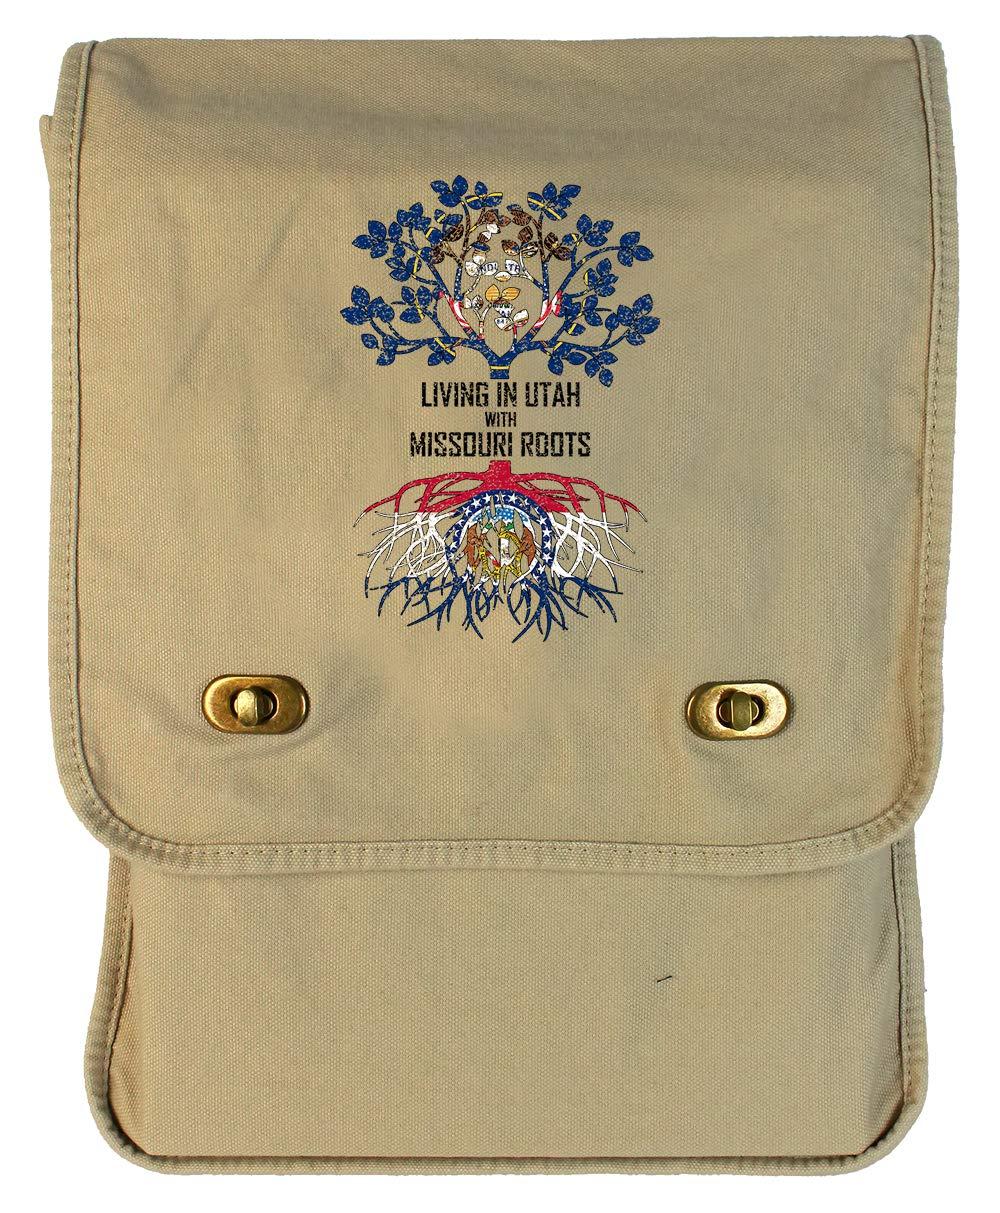 Tenacitee Living In Utah with Missouri Roots Grey Brushed Canvas Messenger Bag